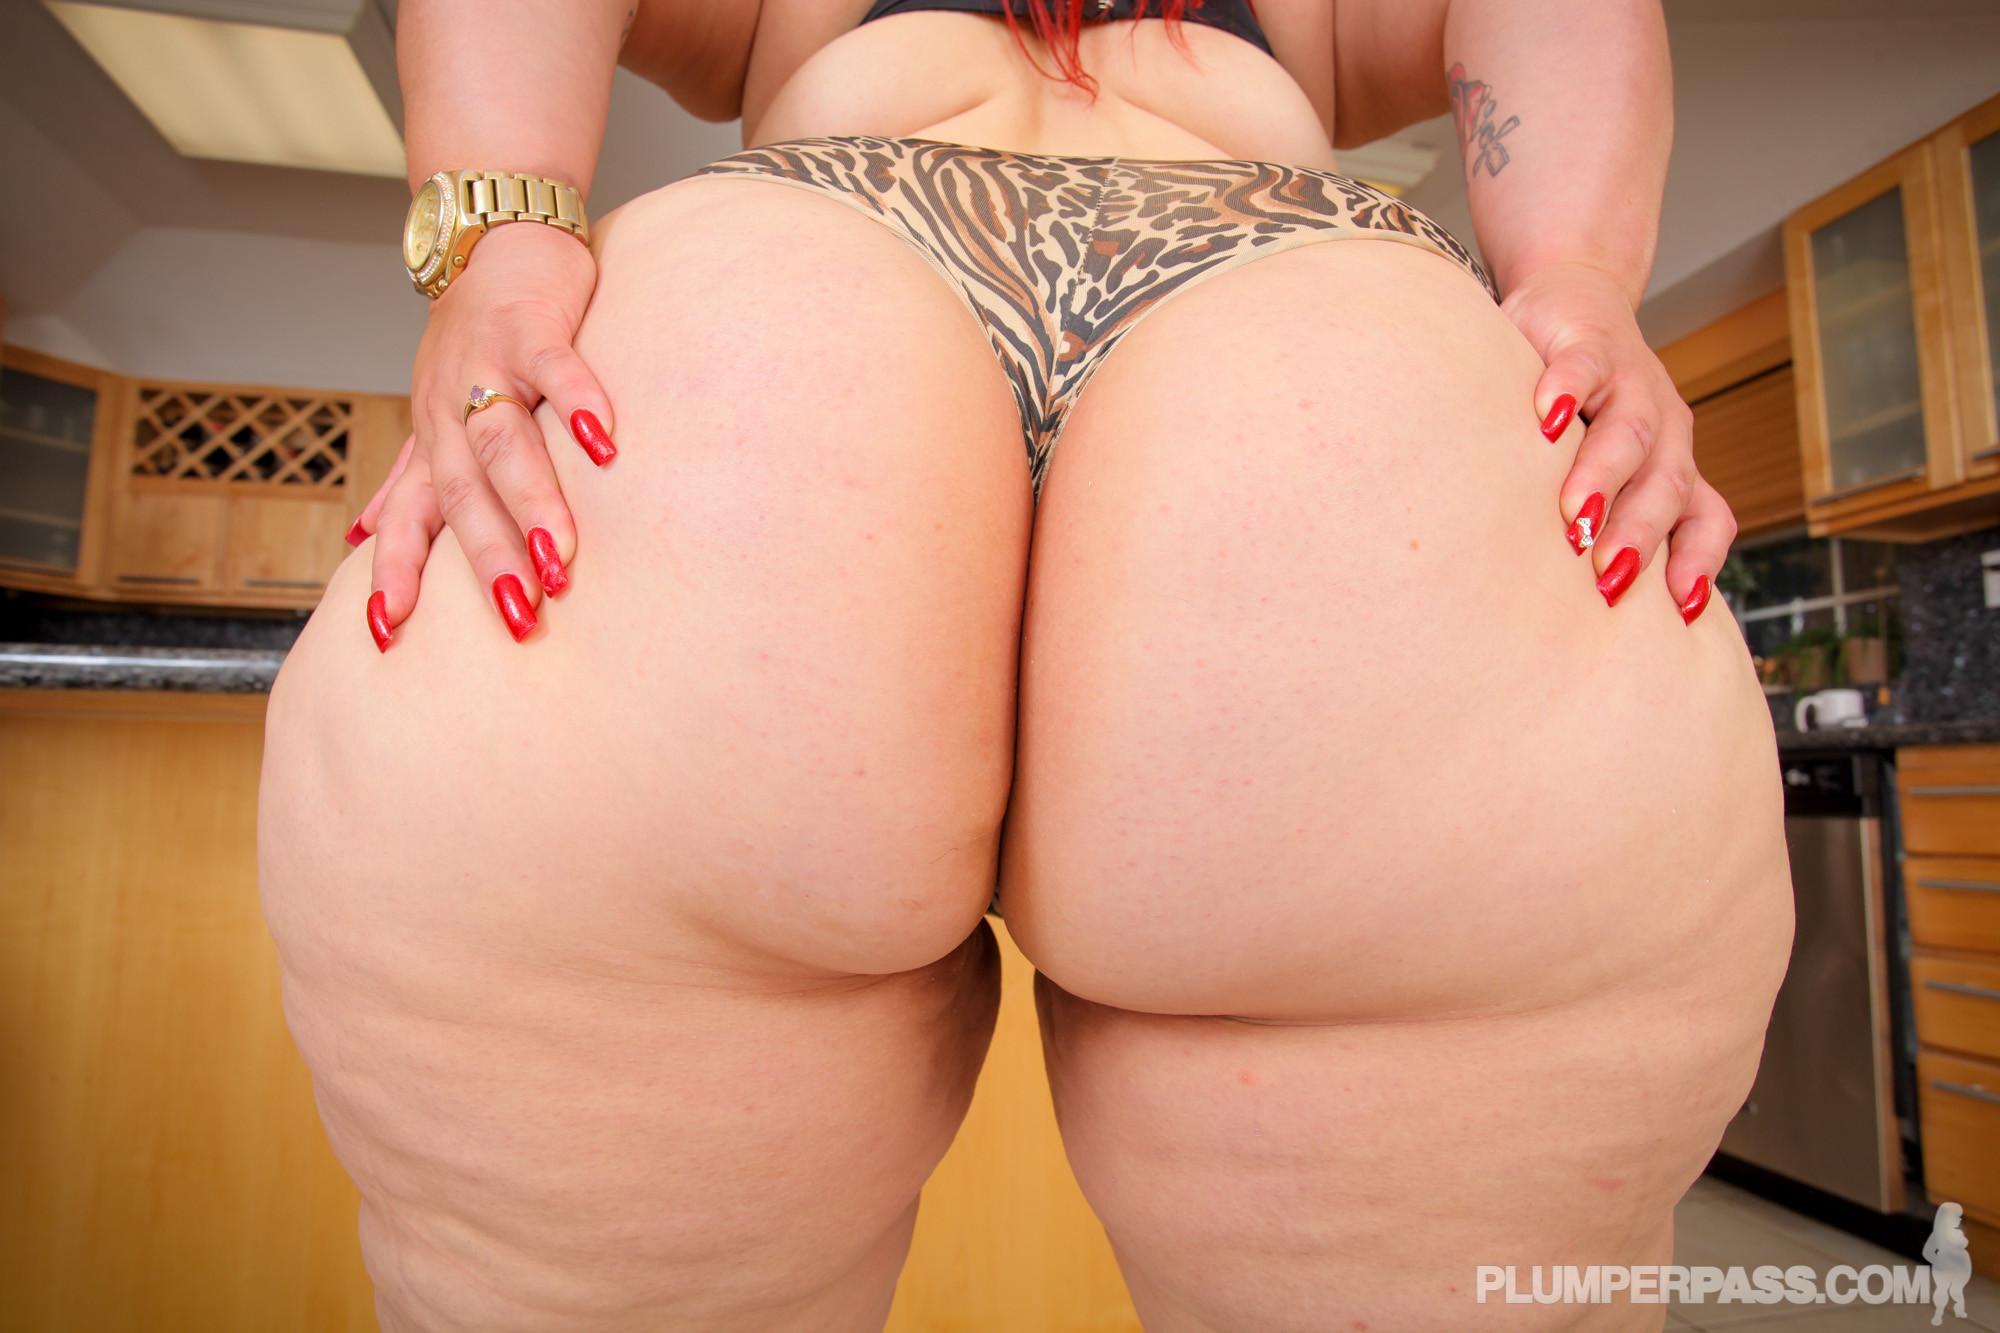 Big Tits Latina Riding Dildo